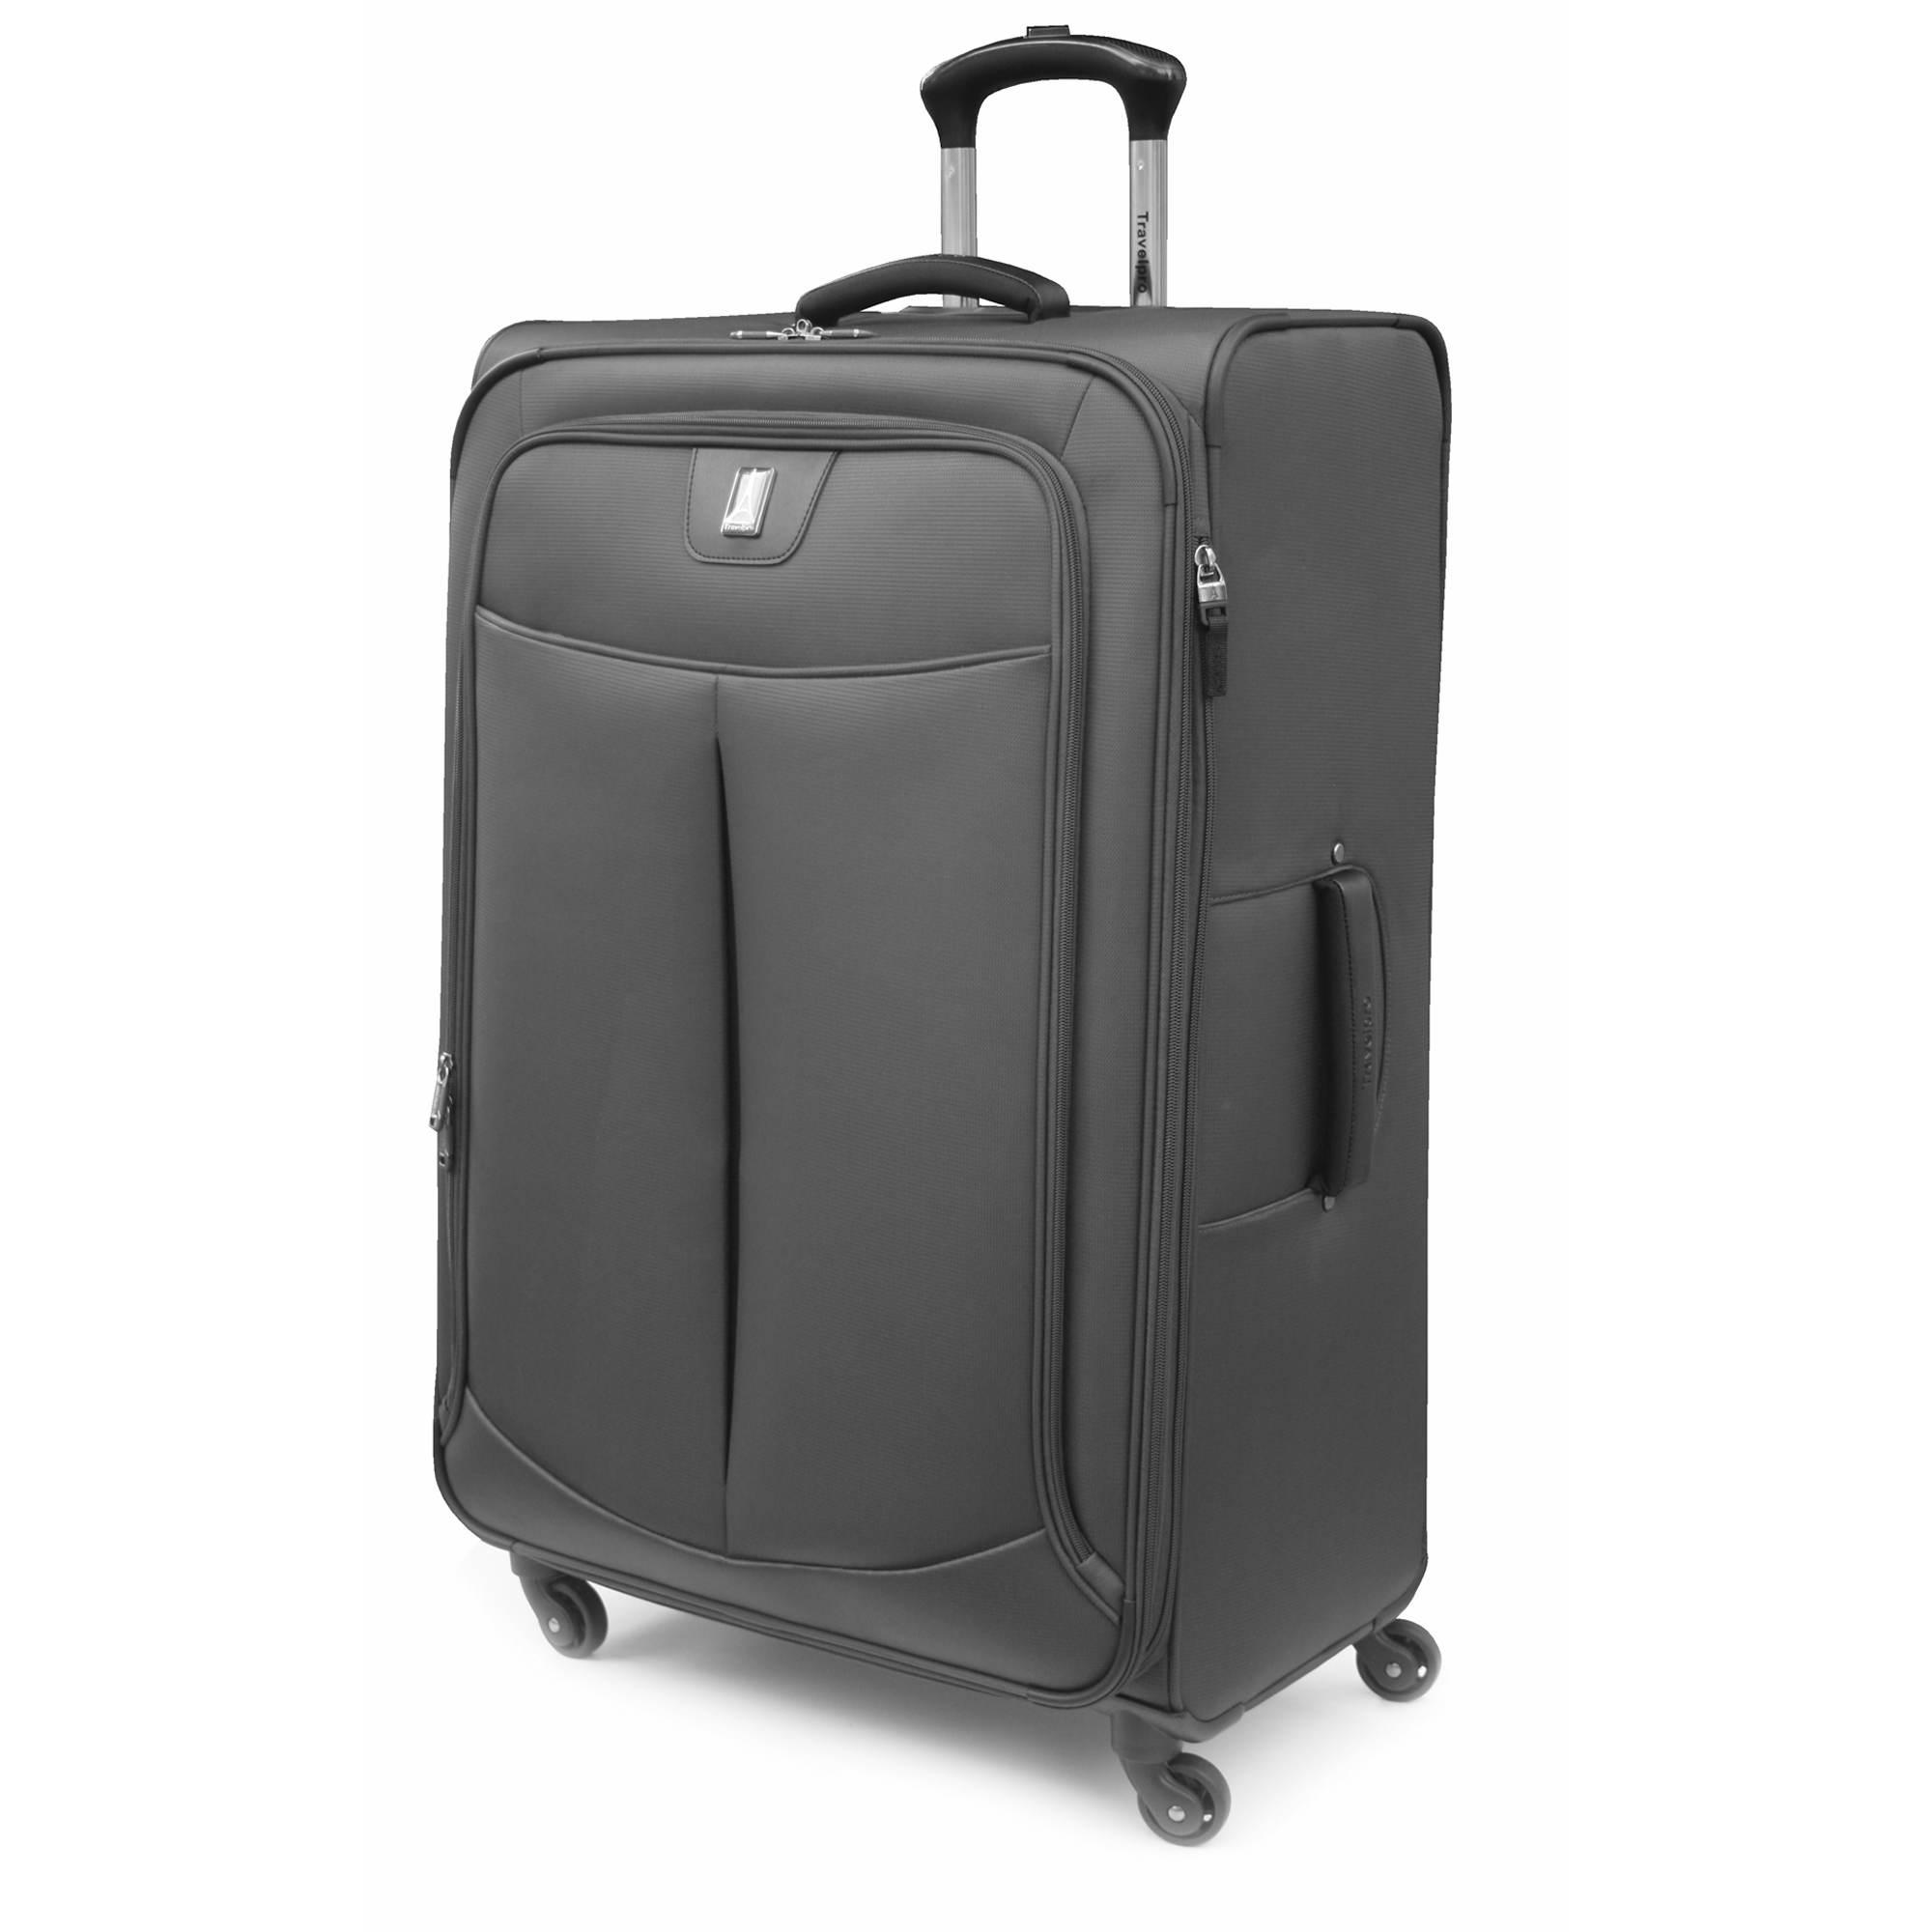 59f1bed57680 Travel Pro 29